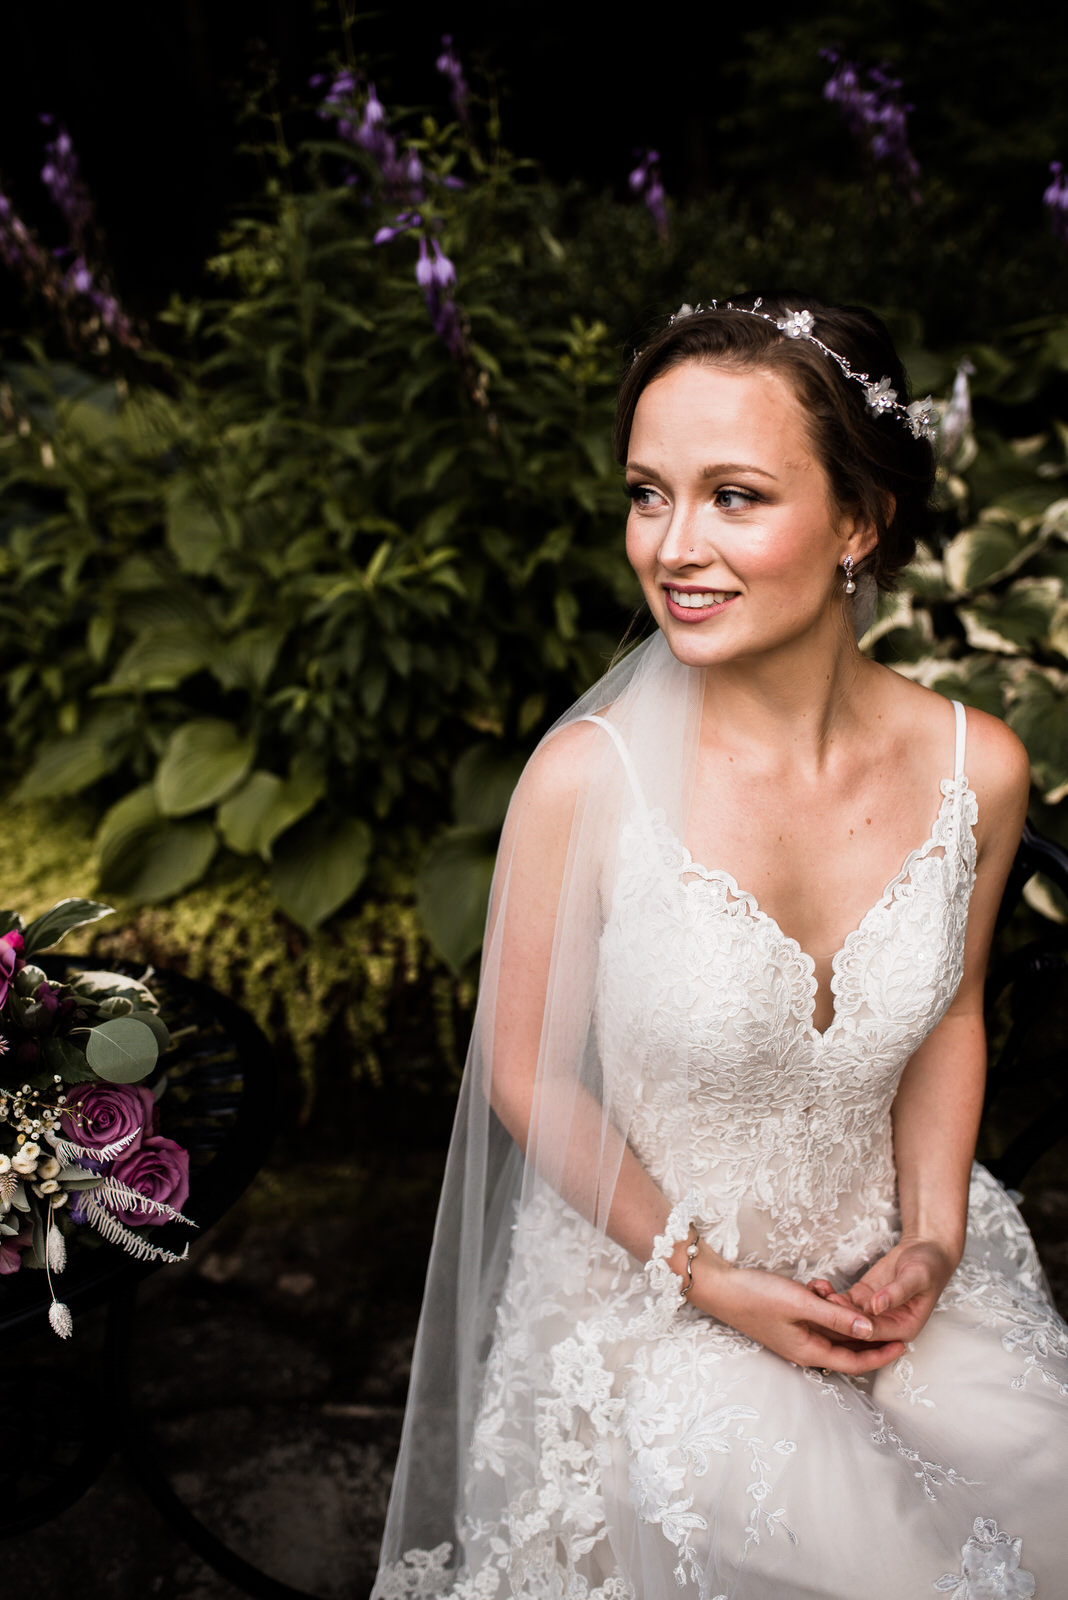 romantic garden bridal session - INN AT TRANQUILITY FARMS | WAYNESVILLE, NC